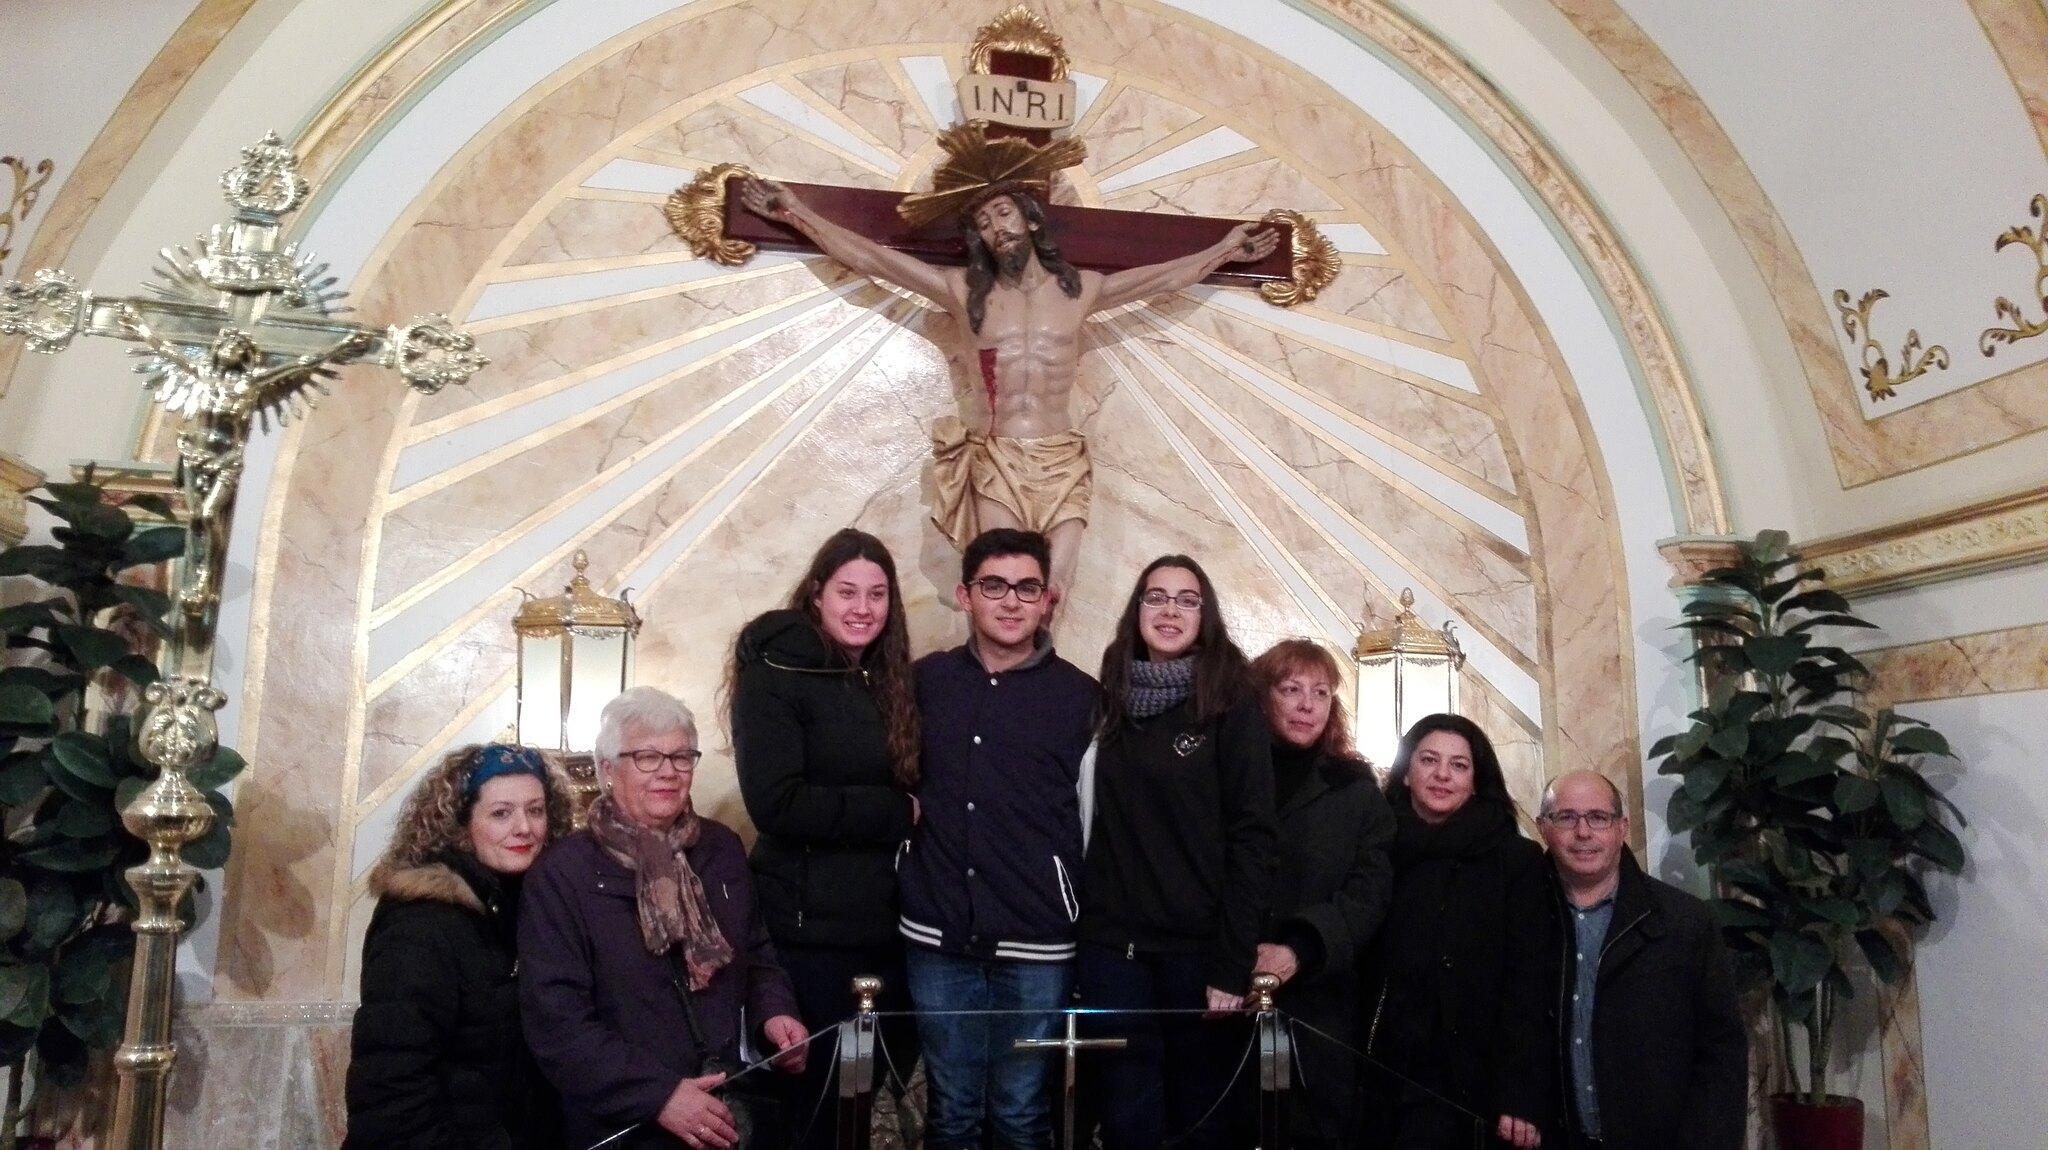 (2016-03-18) - VII Vía Crucis nocturno - Javier Romero Ripoll (129)